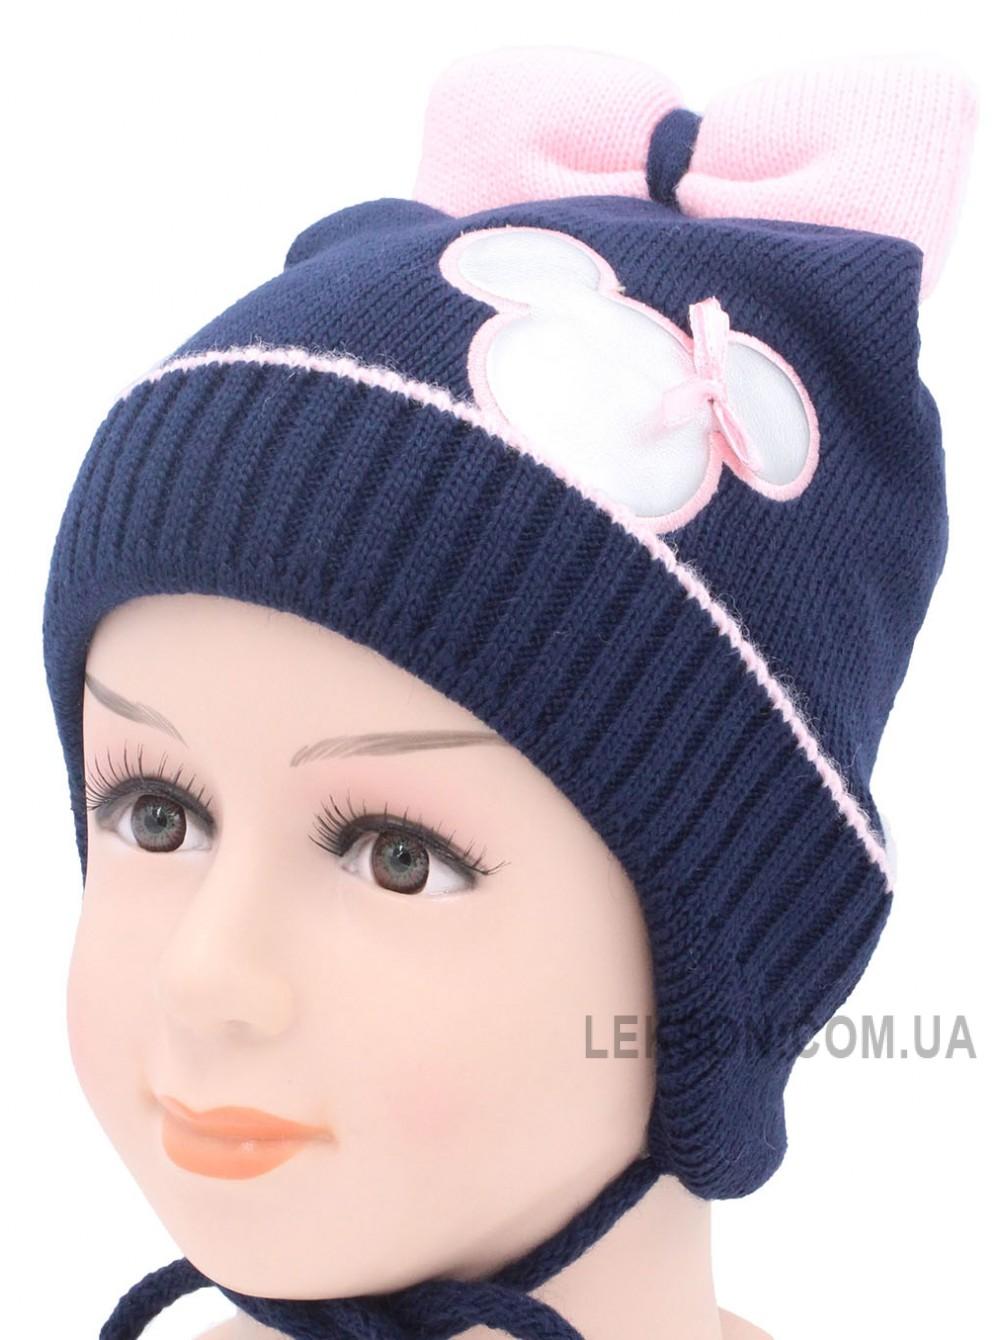 Детская вязаная шапка Мышка D42826-46-50